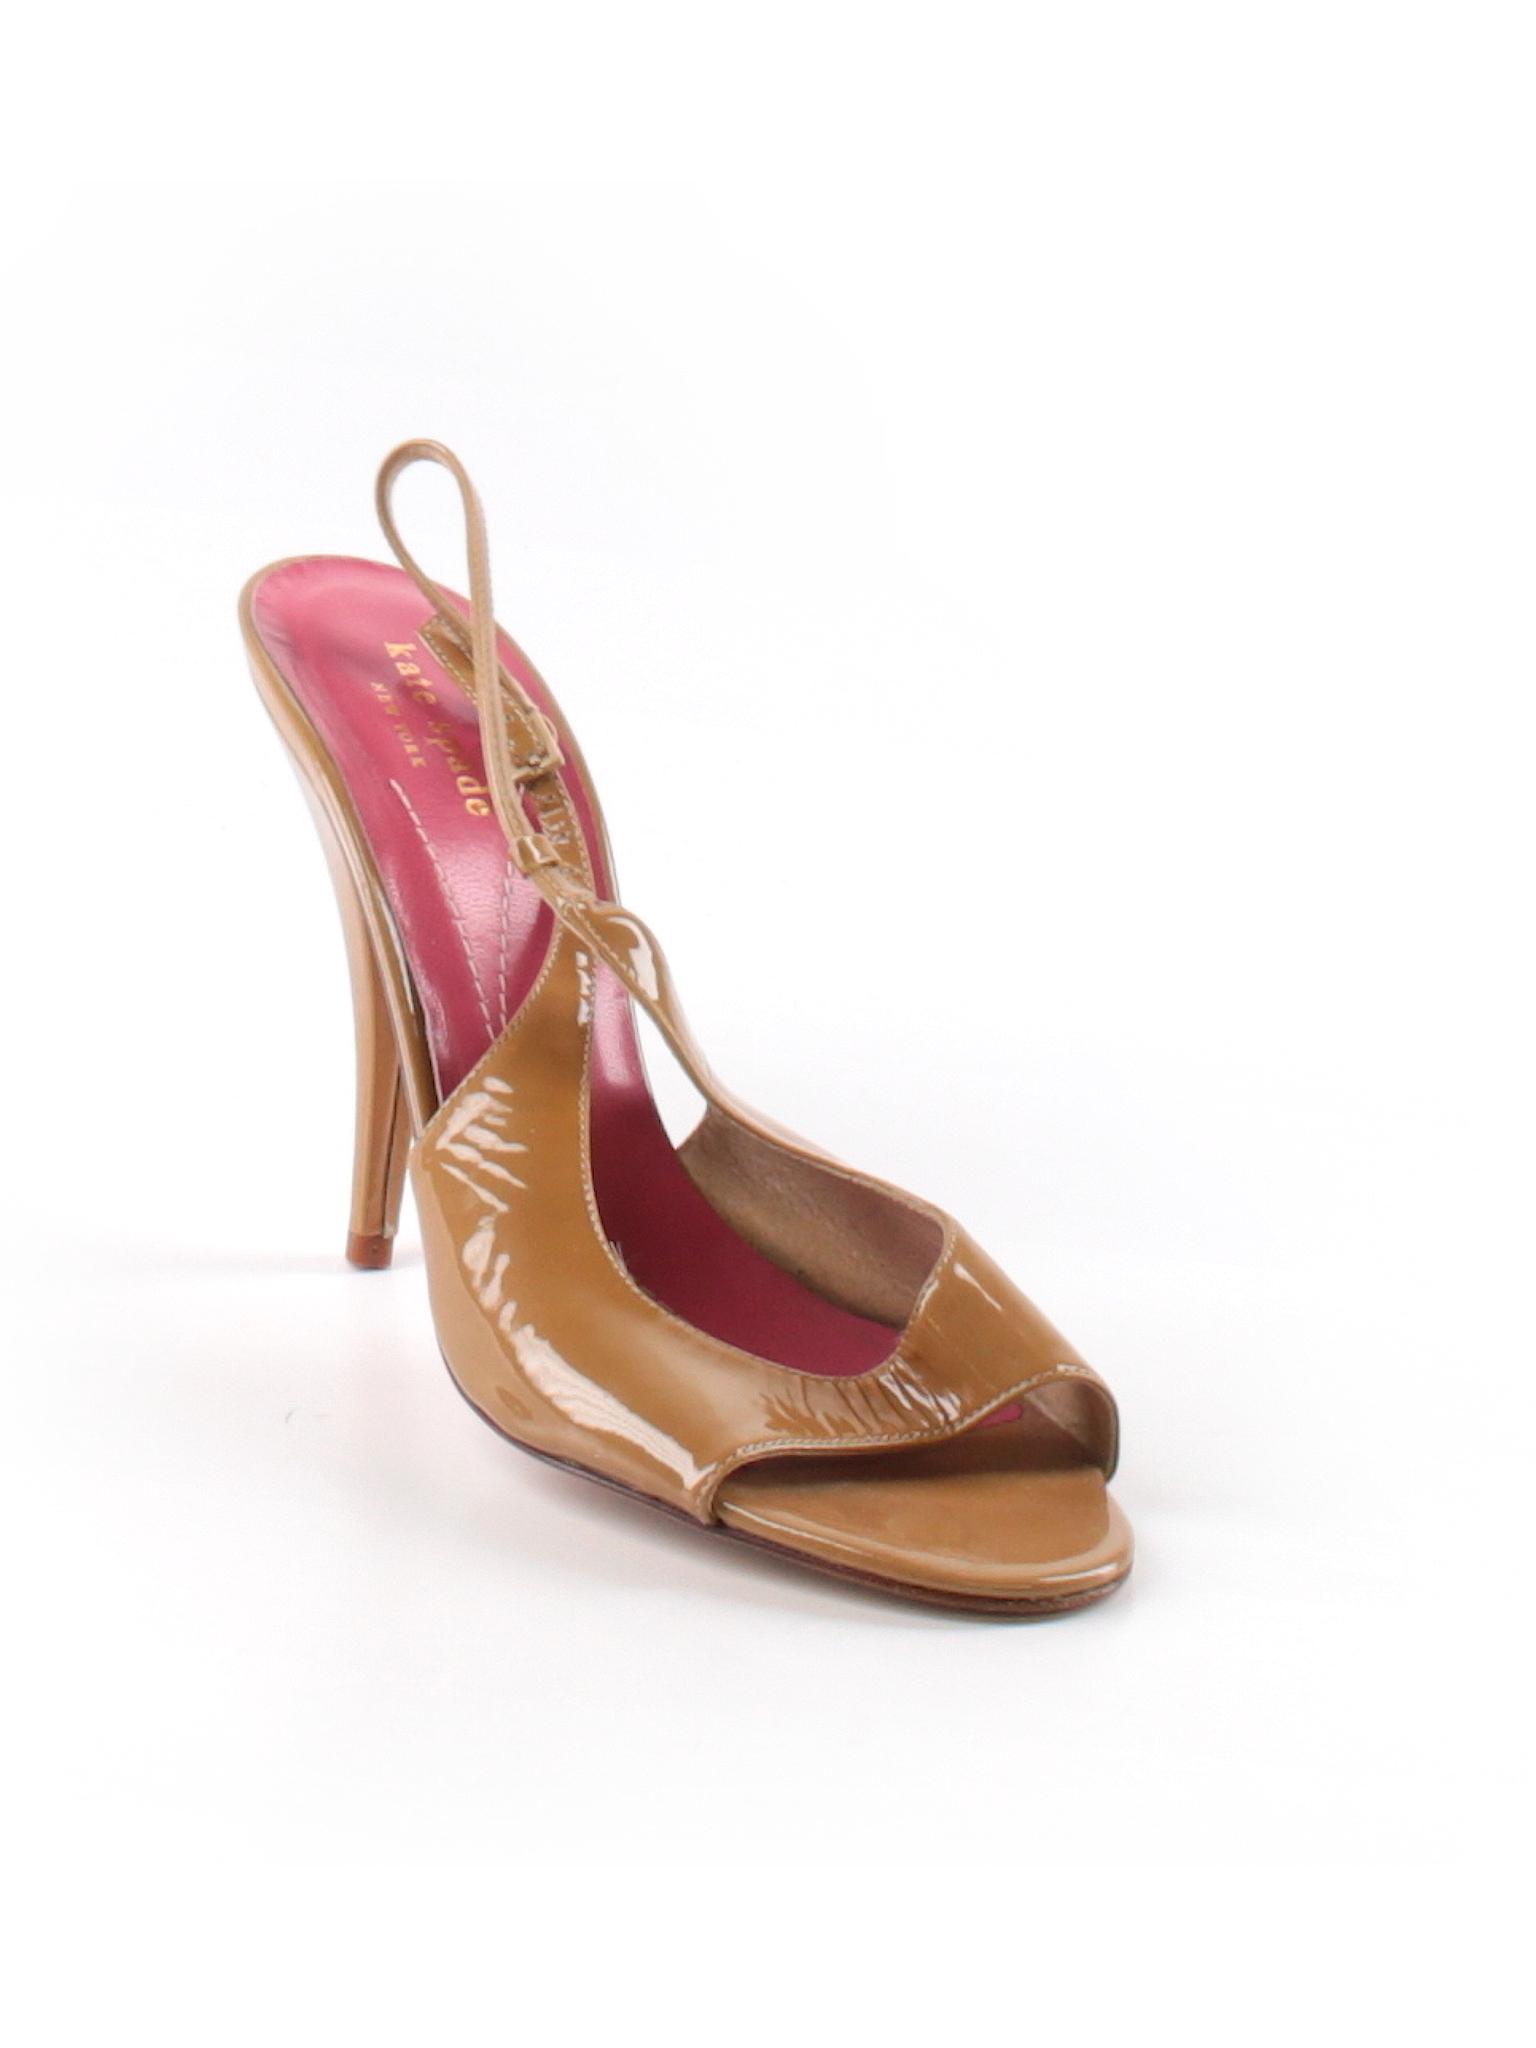 Heels Boutique promotion New York Kate Spade TTUCBq8